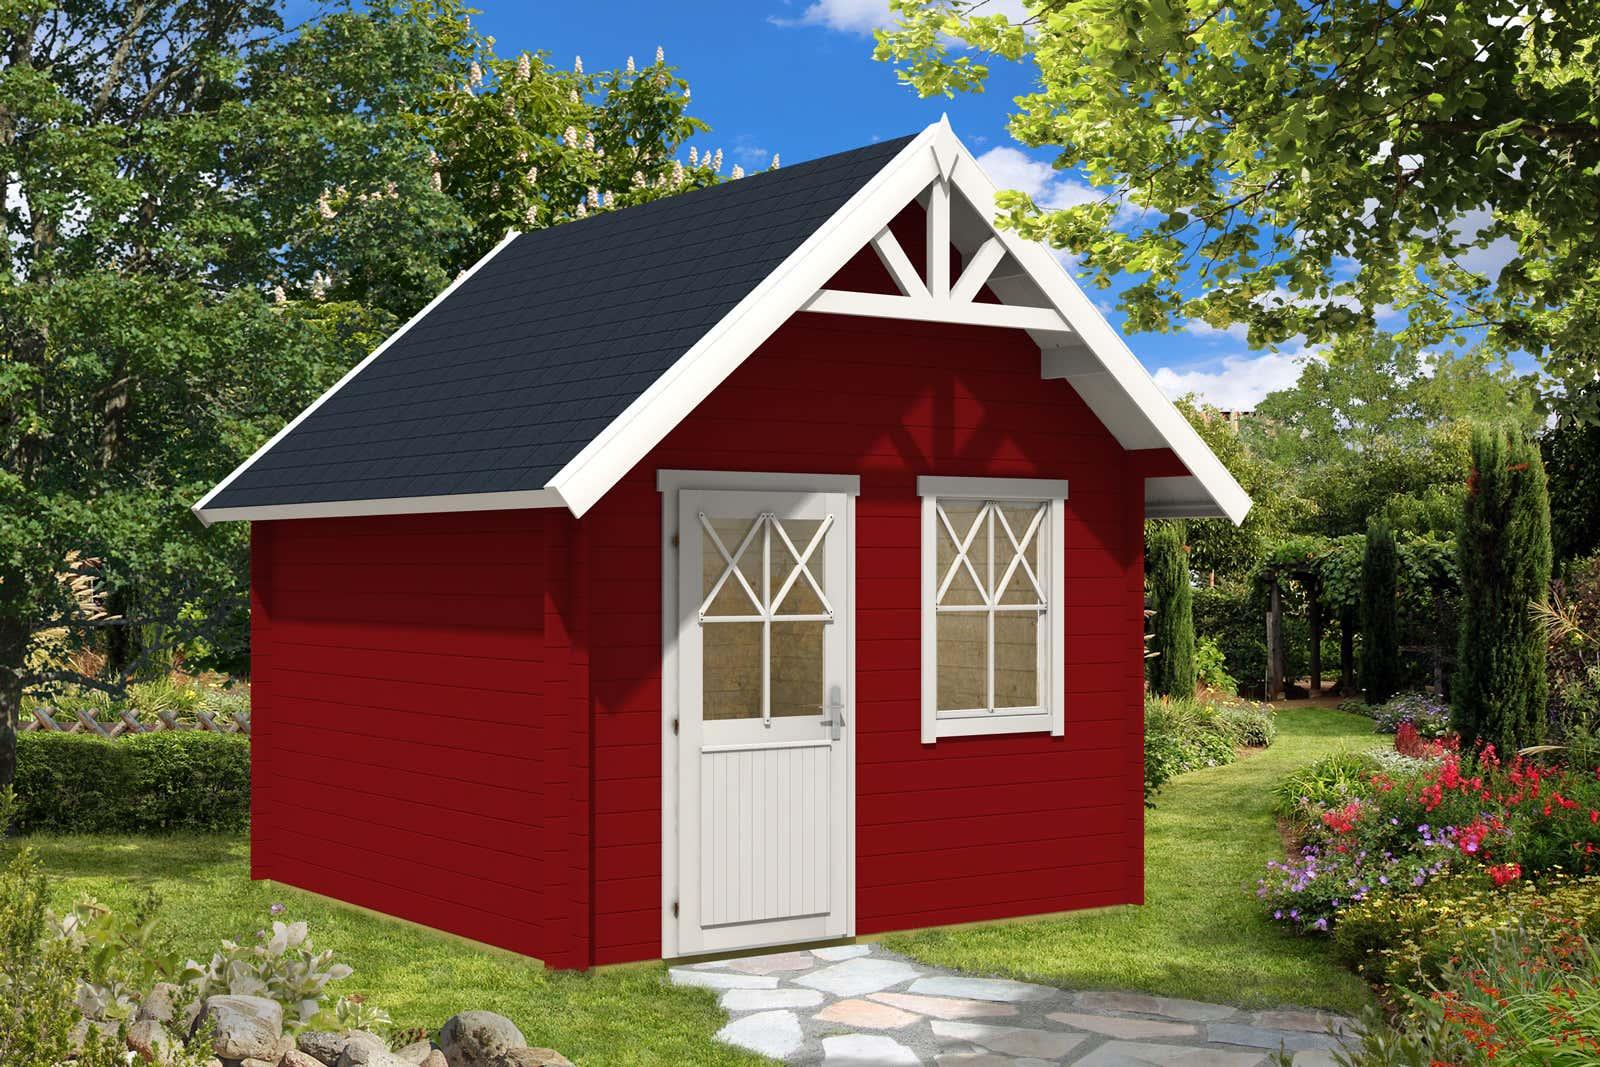 schwedenhaus 28 a z gartenhaus gmbh. Black Bedroom Furniture Sets. Home Design Ideas